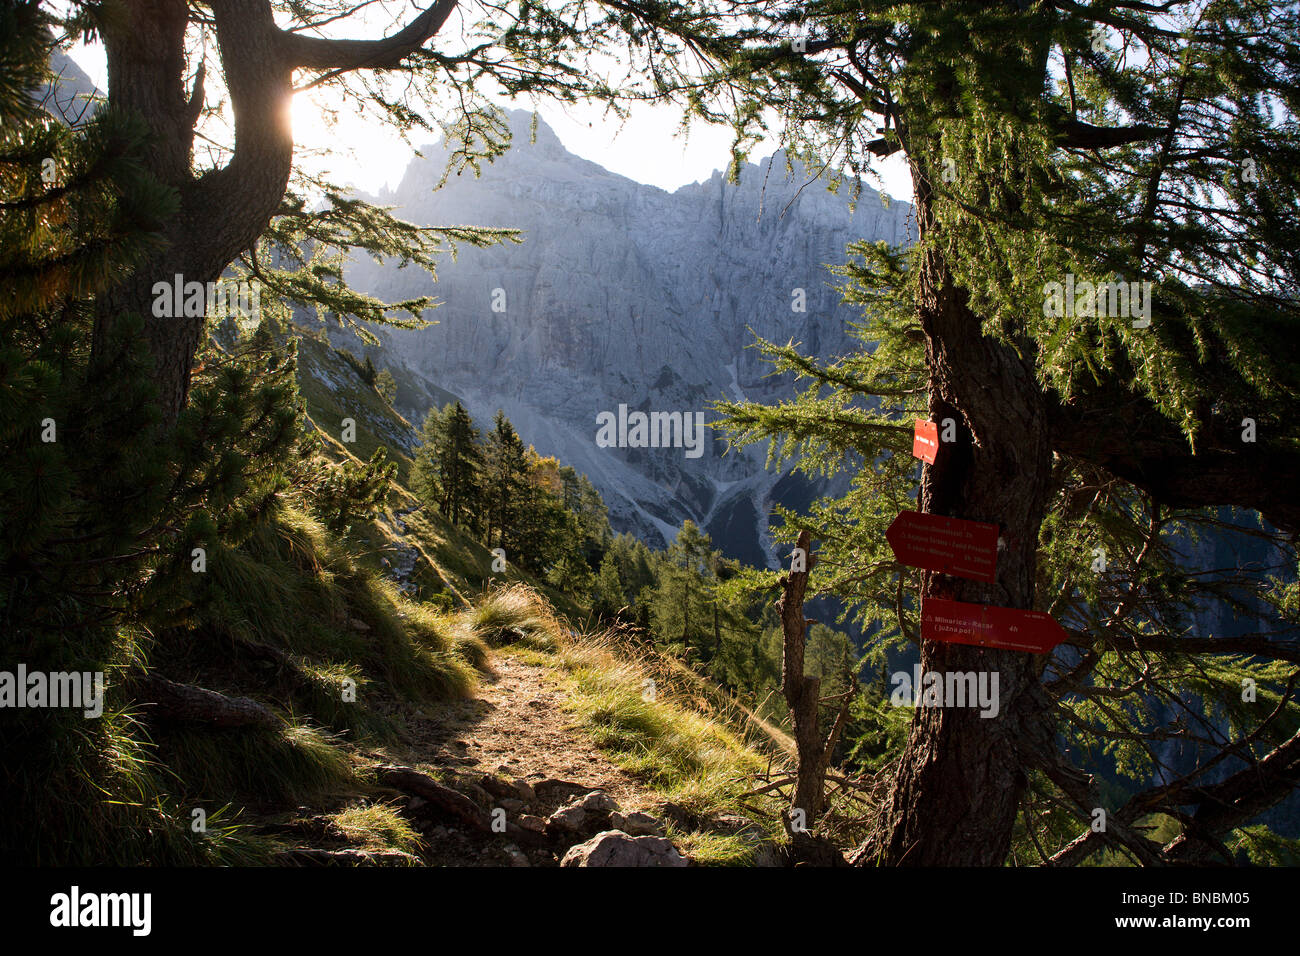 Alpen-Landschaft in Slowenien - Hintergrundbeleuchtung - Julischen Alpen Stockbild